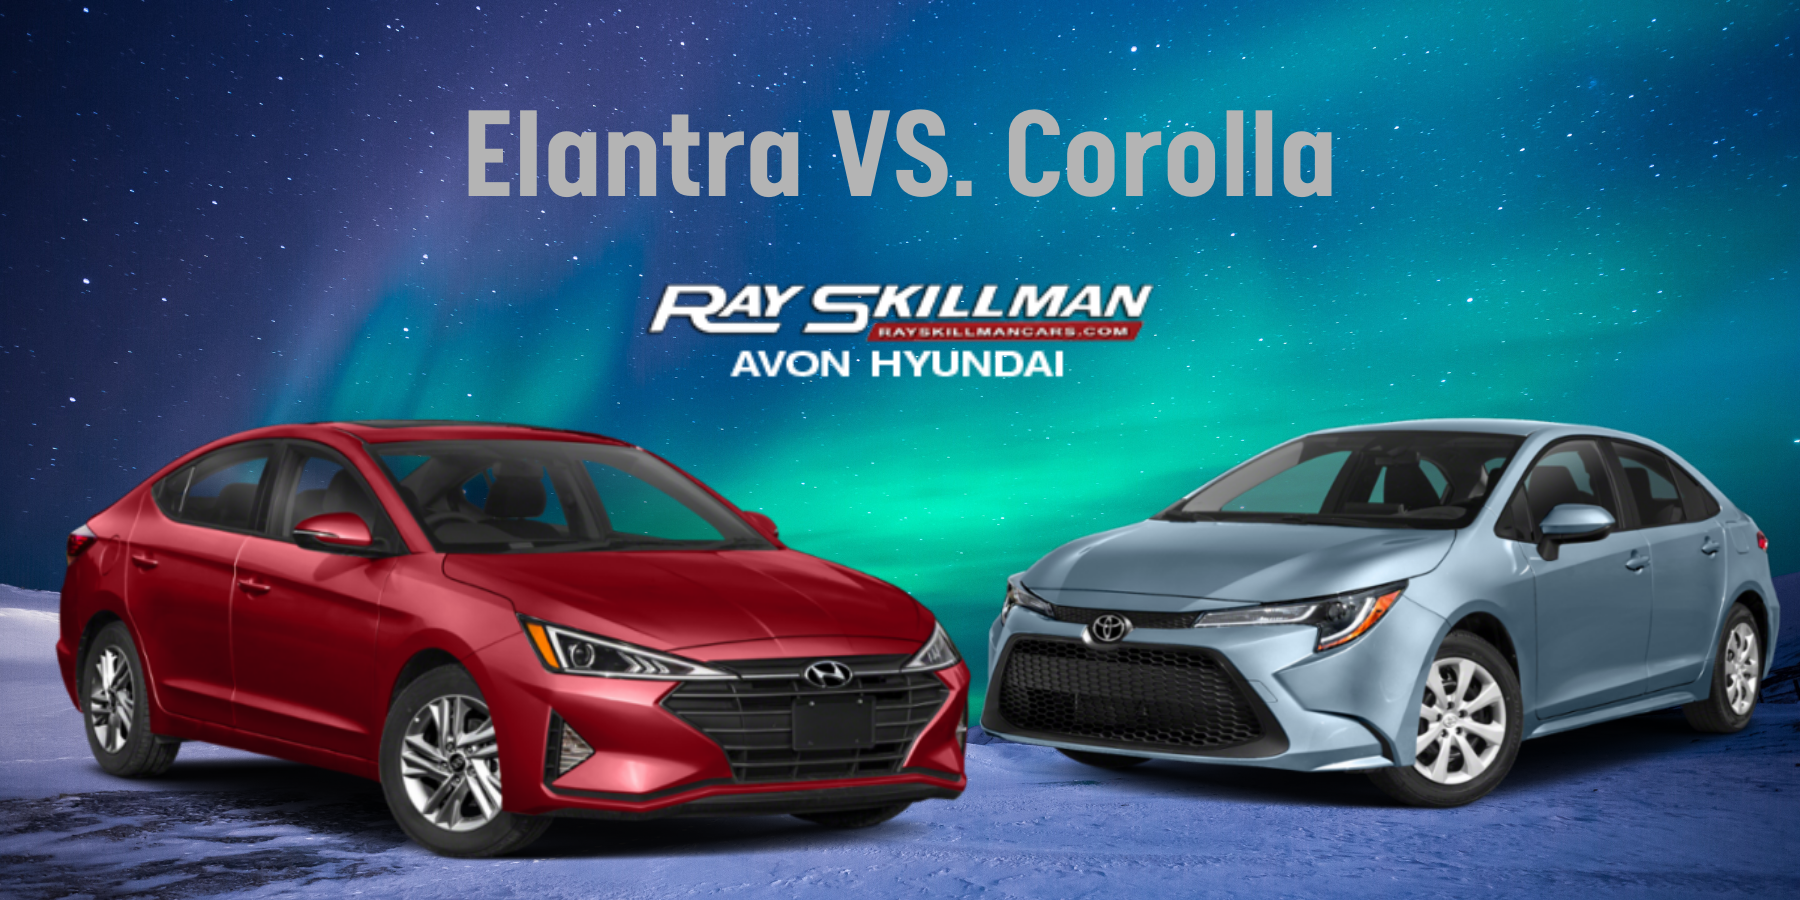 Hyundai Elantra vs Toyota Corolla Avon IN